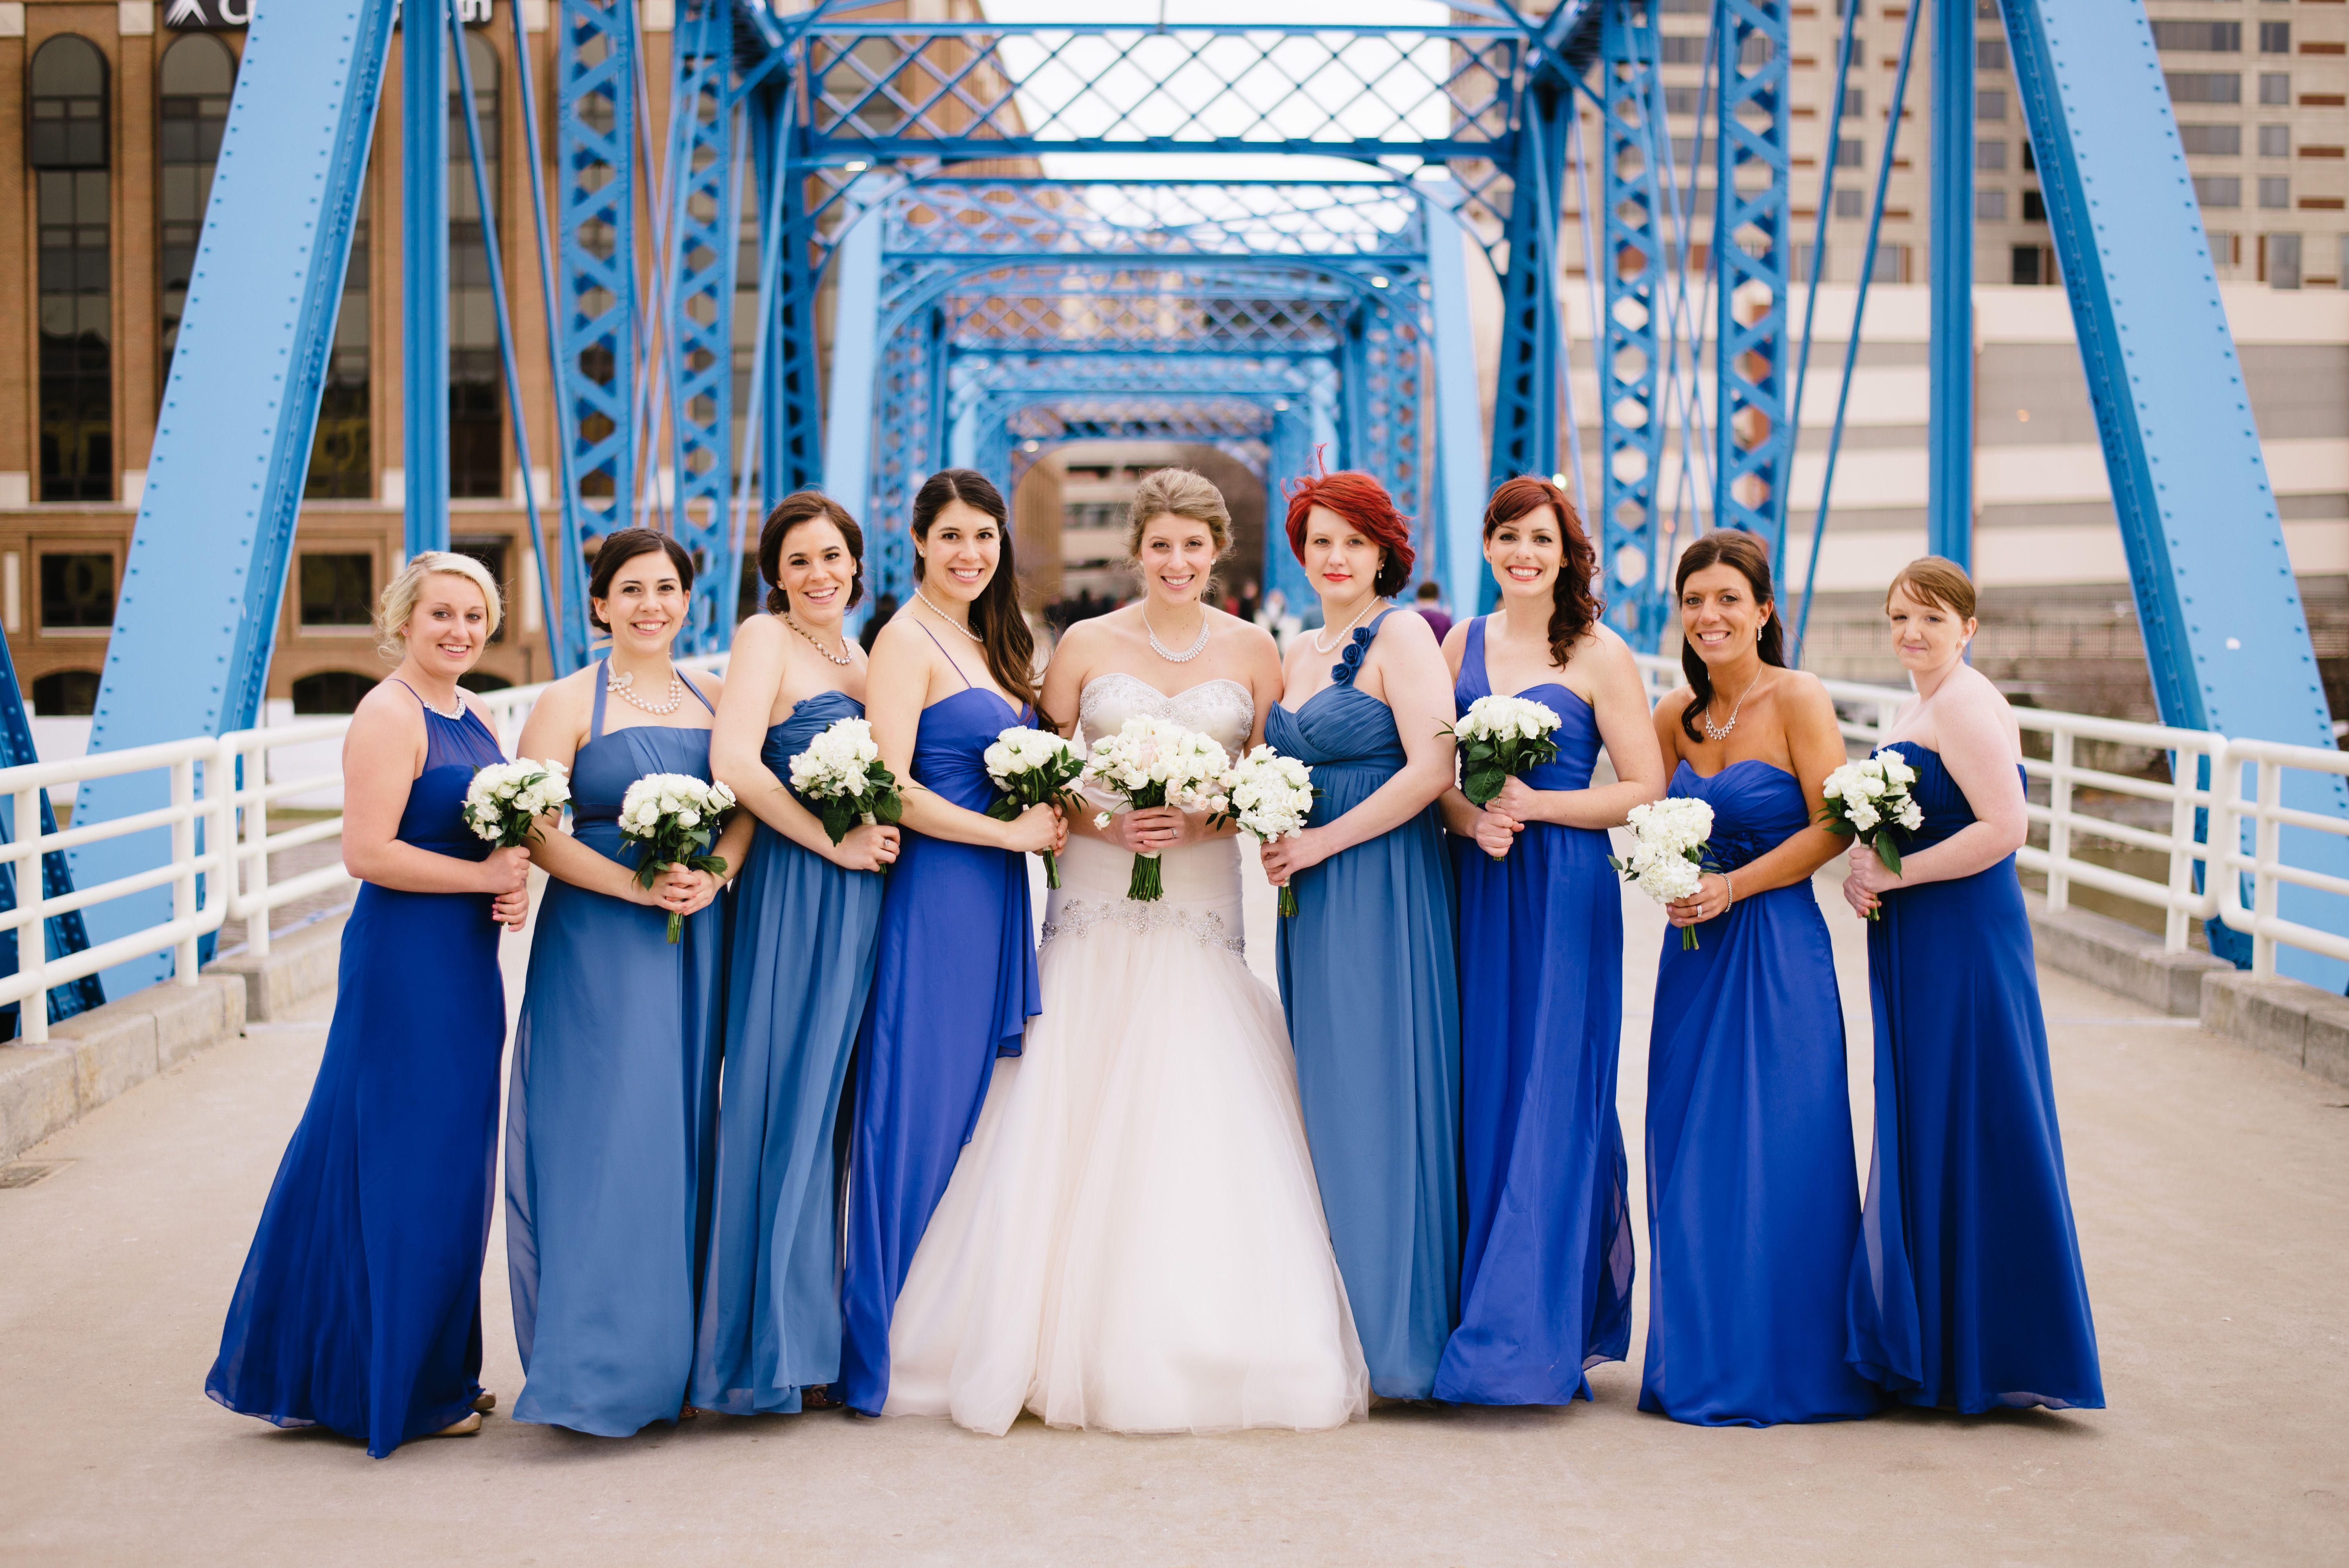 Indigo Bridesmaid Dresses | Alfred Angelo Chiffon Bridesmaids Dresses In Mediterranean Indigo